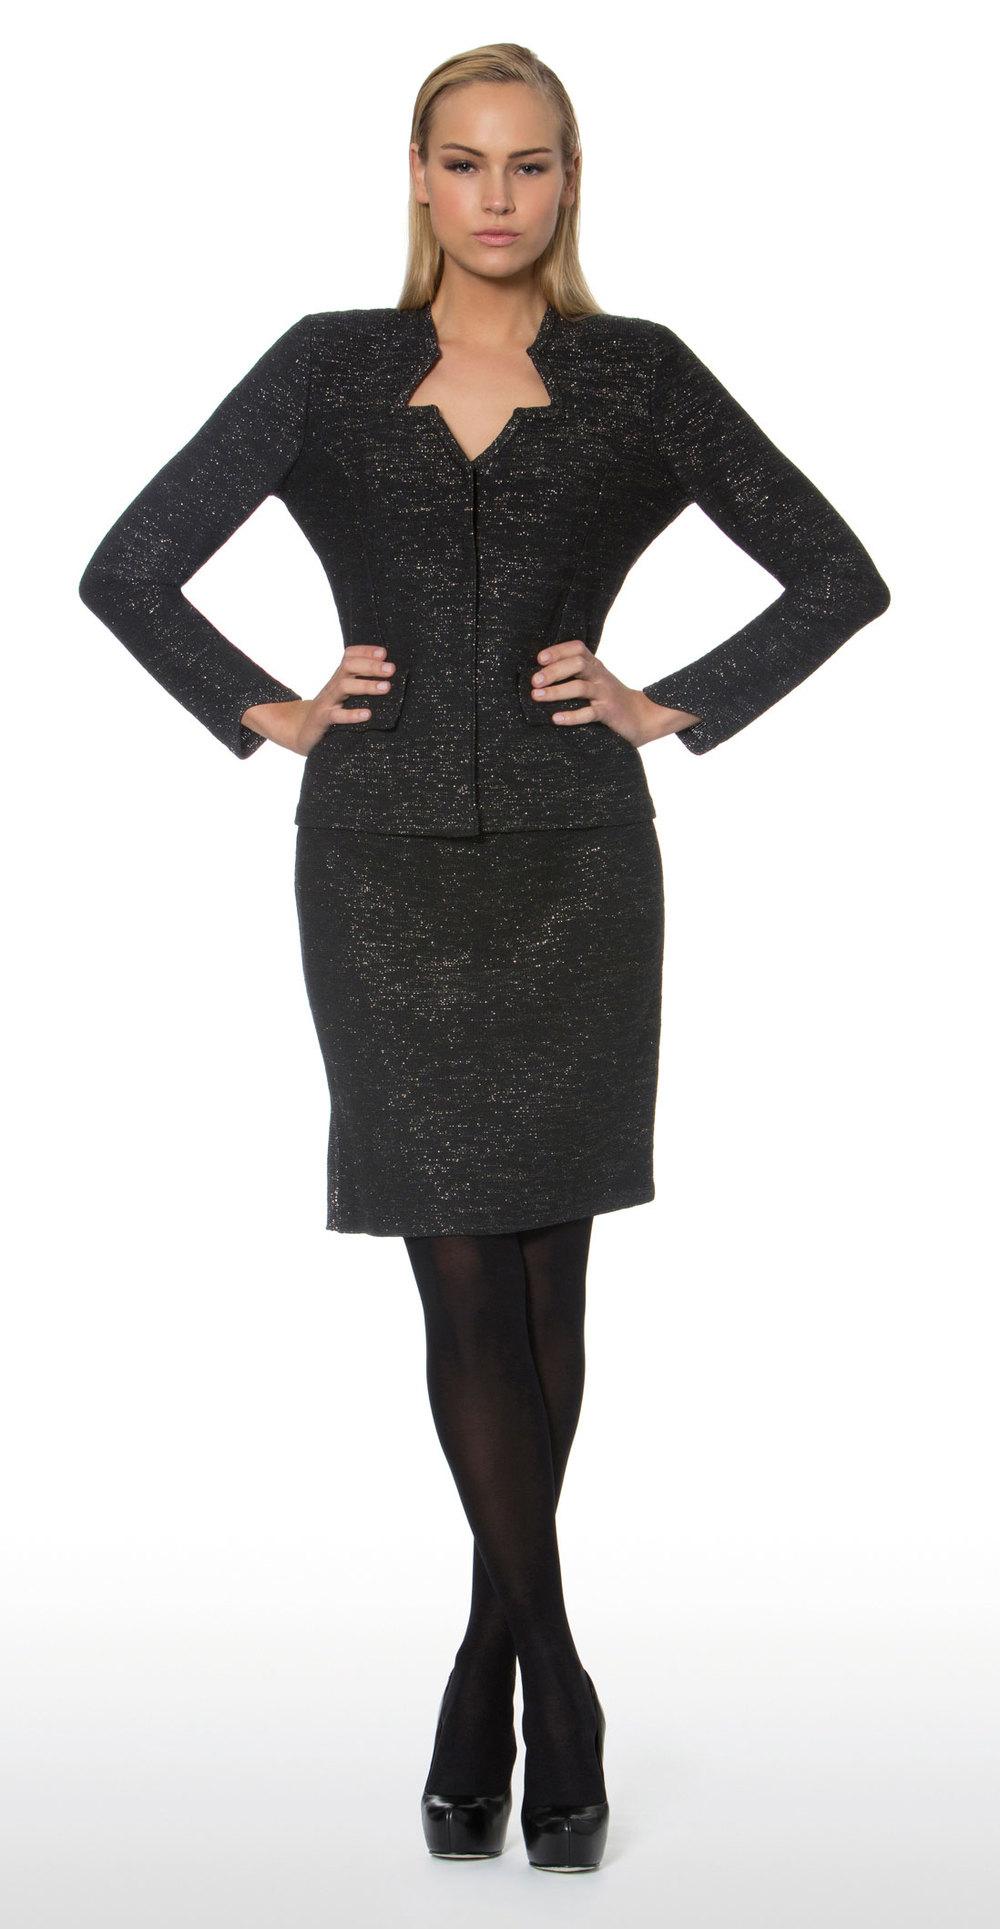 Z-Form-Uniform-Kelsy-Zimba-Jacket-FJ1-Skirt-FS1.jpg